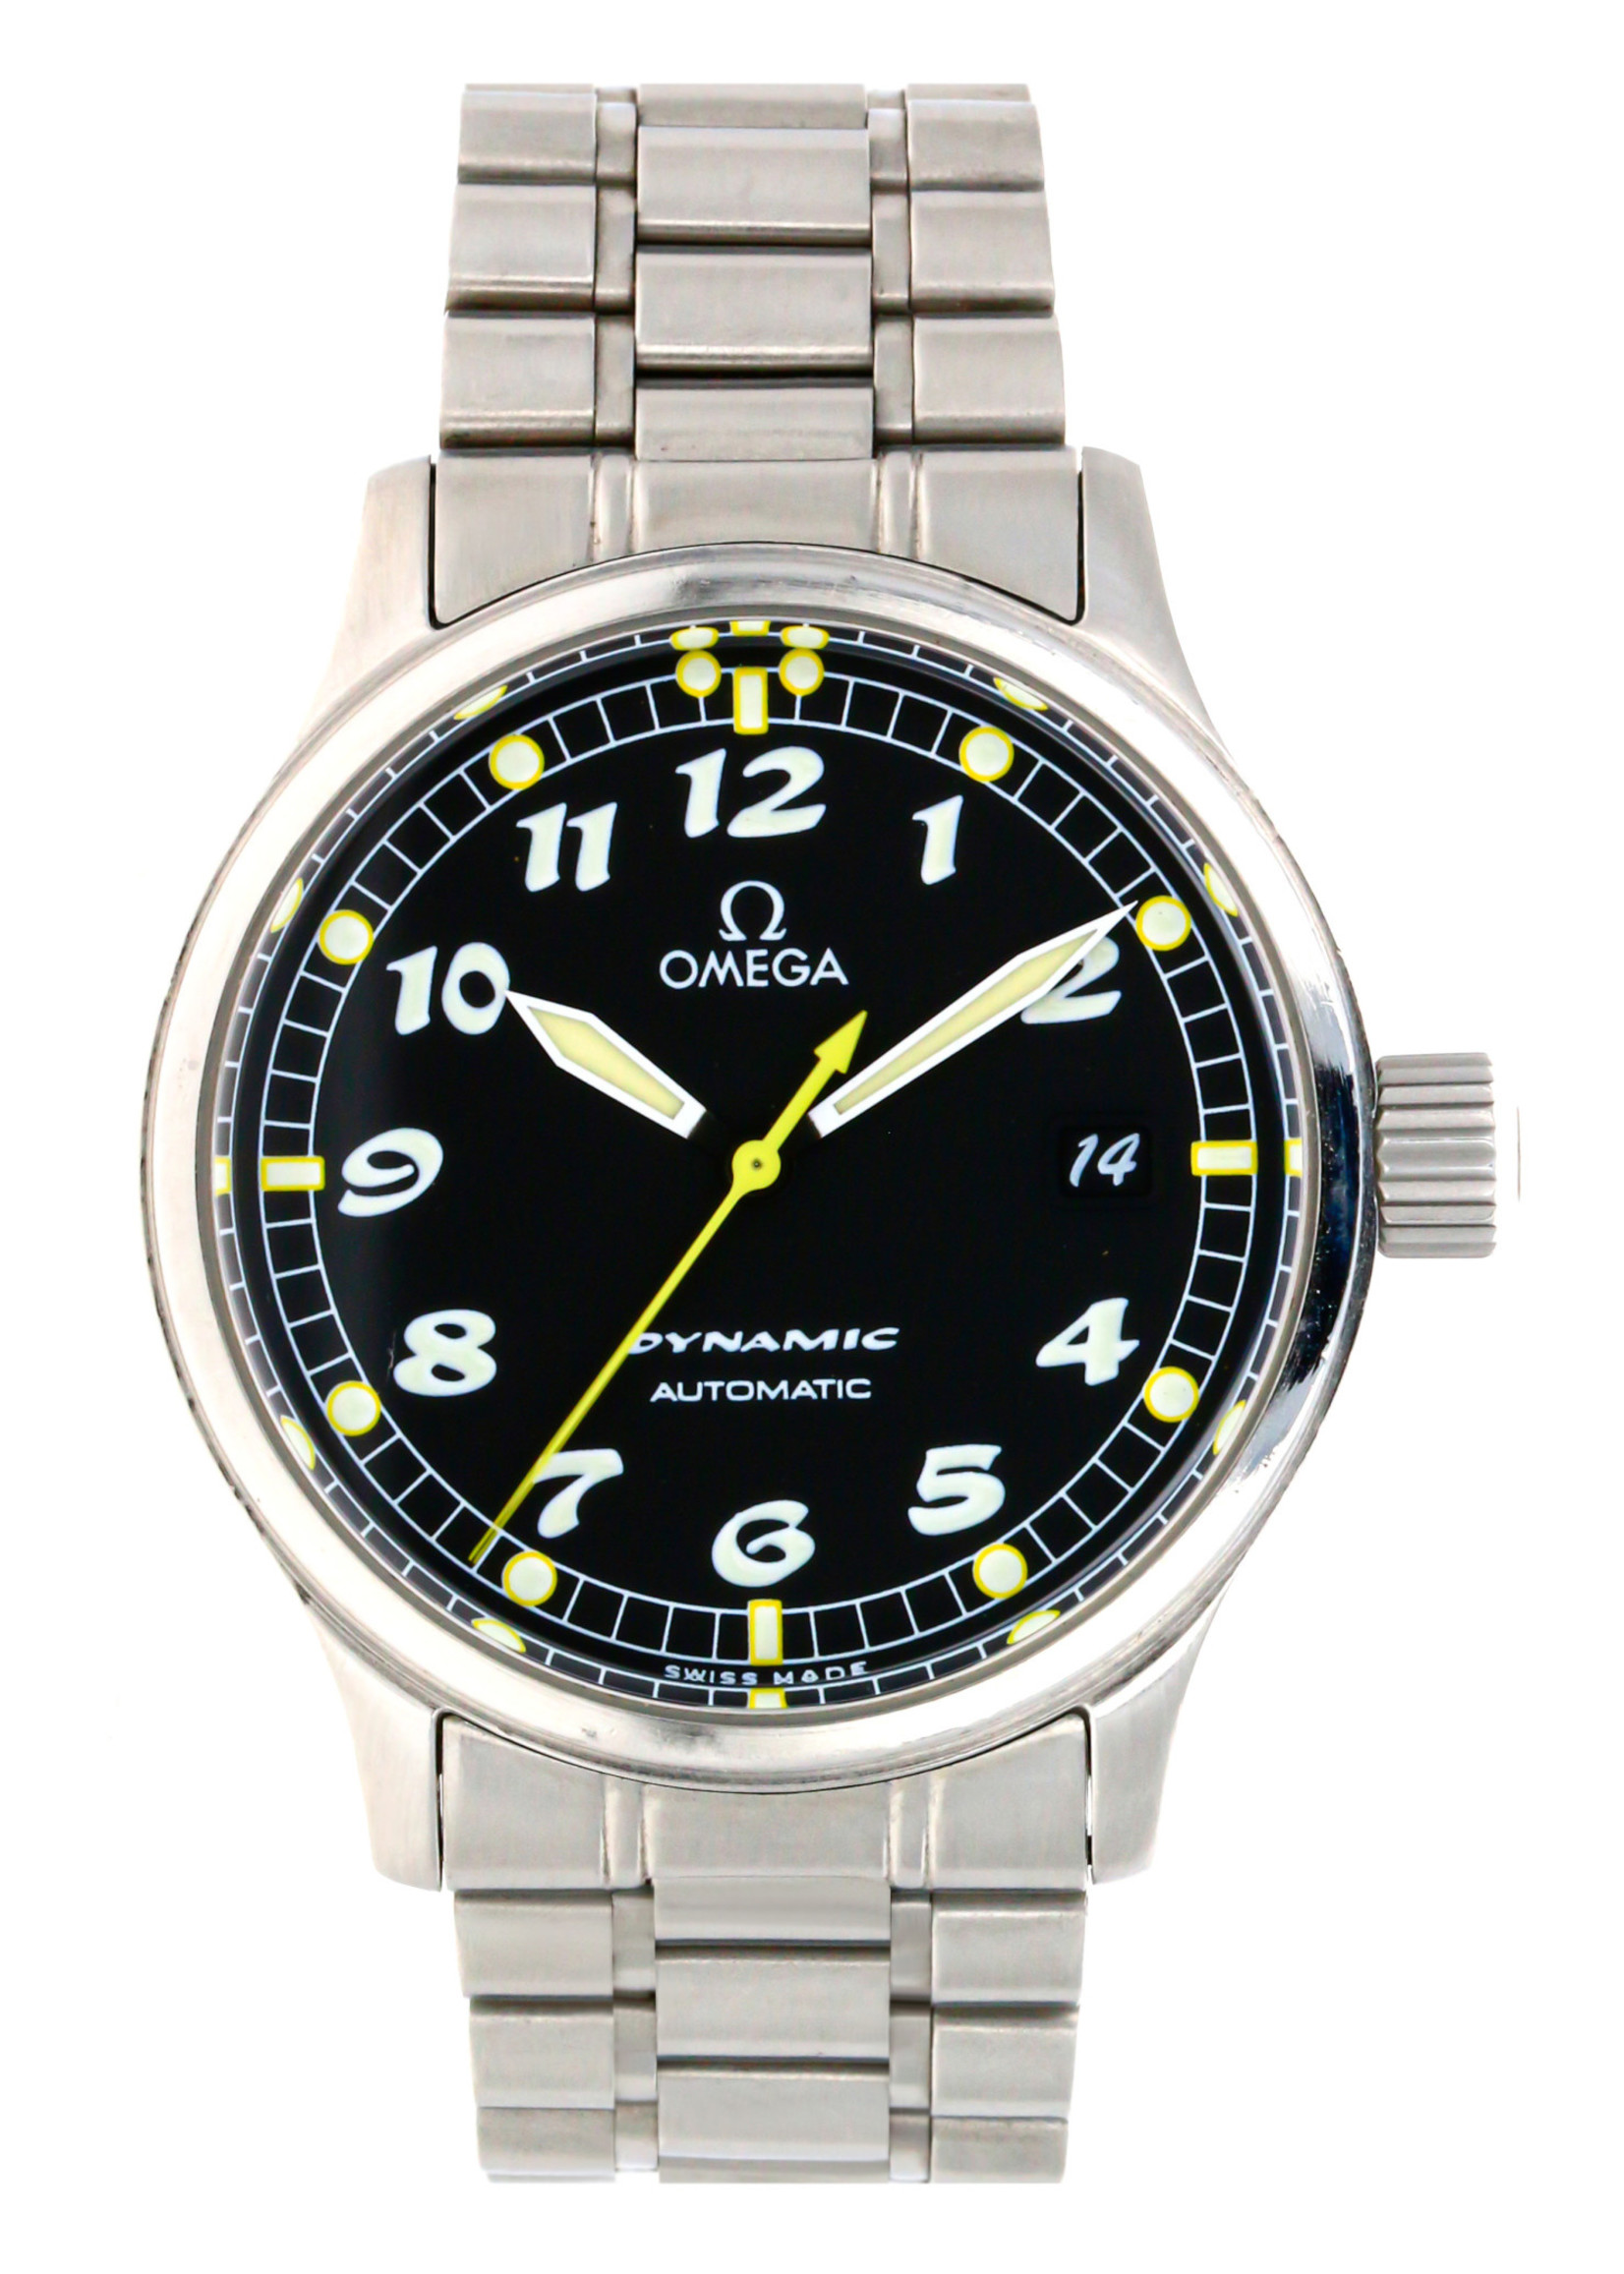 Omega Watches OMEGA DYNAMIC 36MM (2000 B + P) #52005000